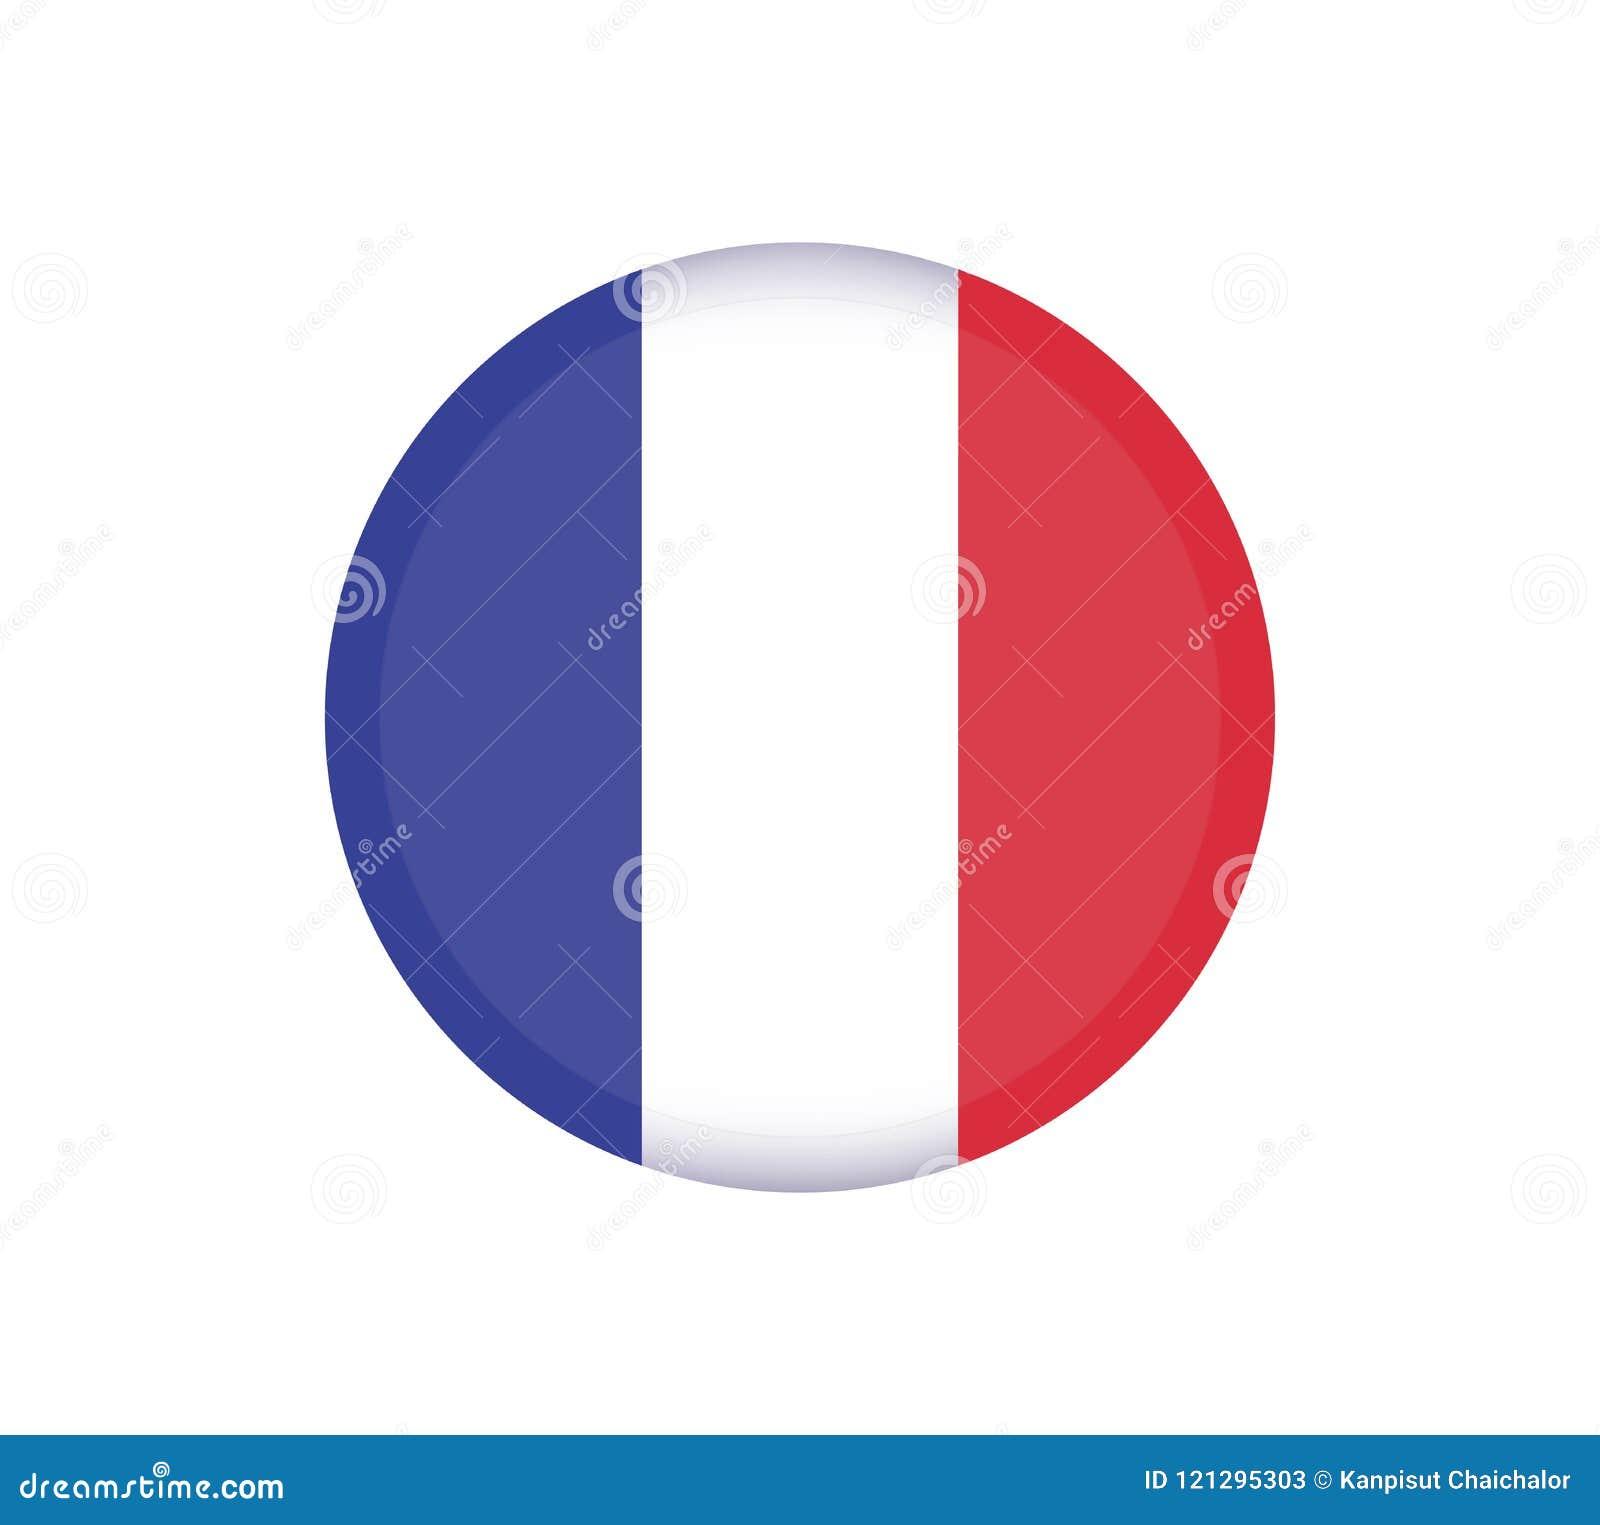 FRANKREICH-Flaggenknopf Frankreich-Flaggen-Vektor-runde Ikone - Illustration